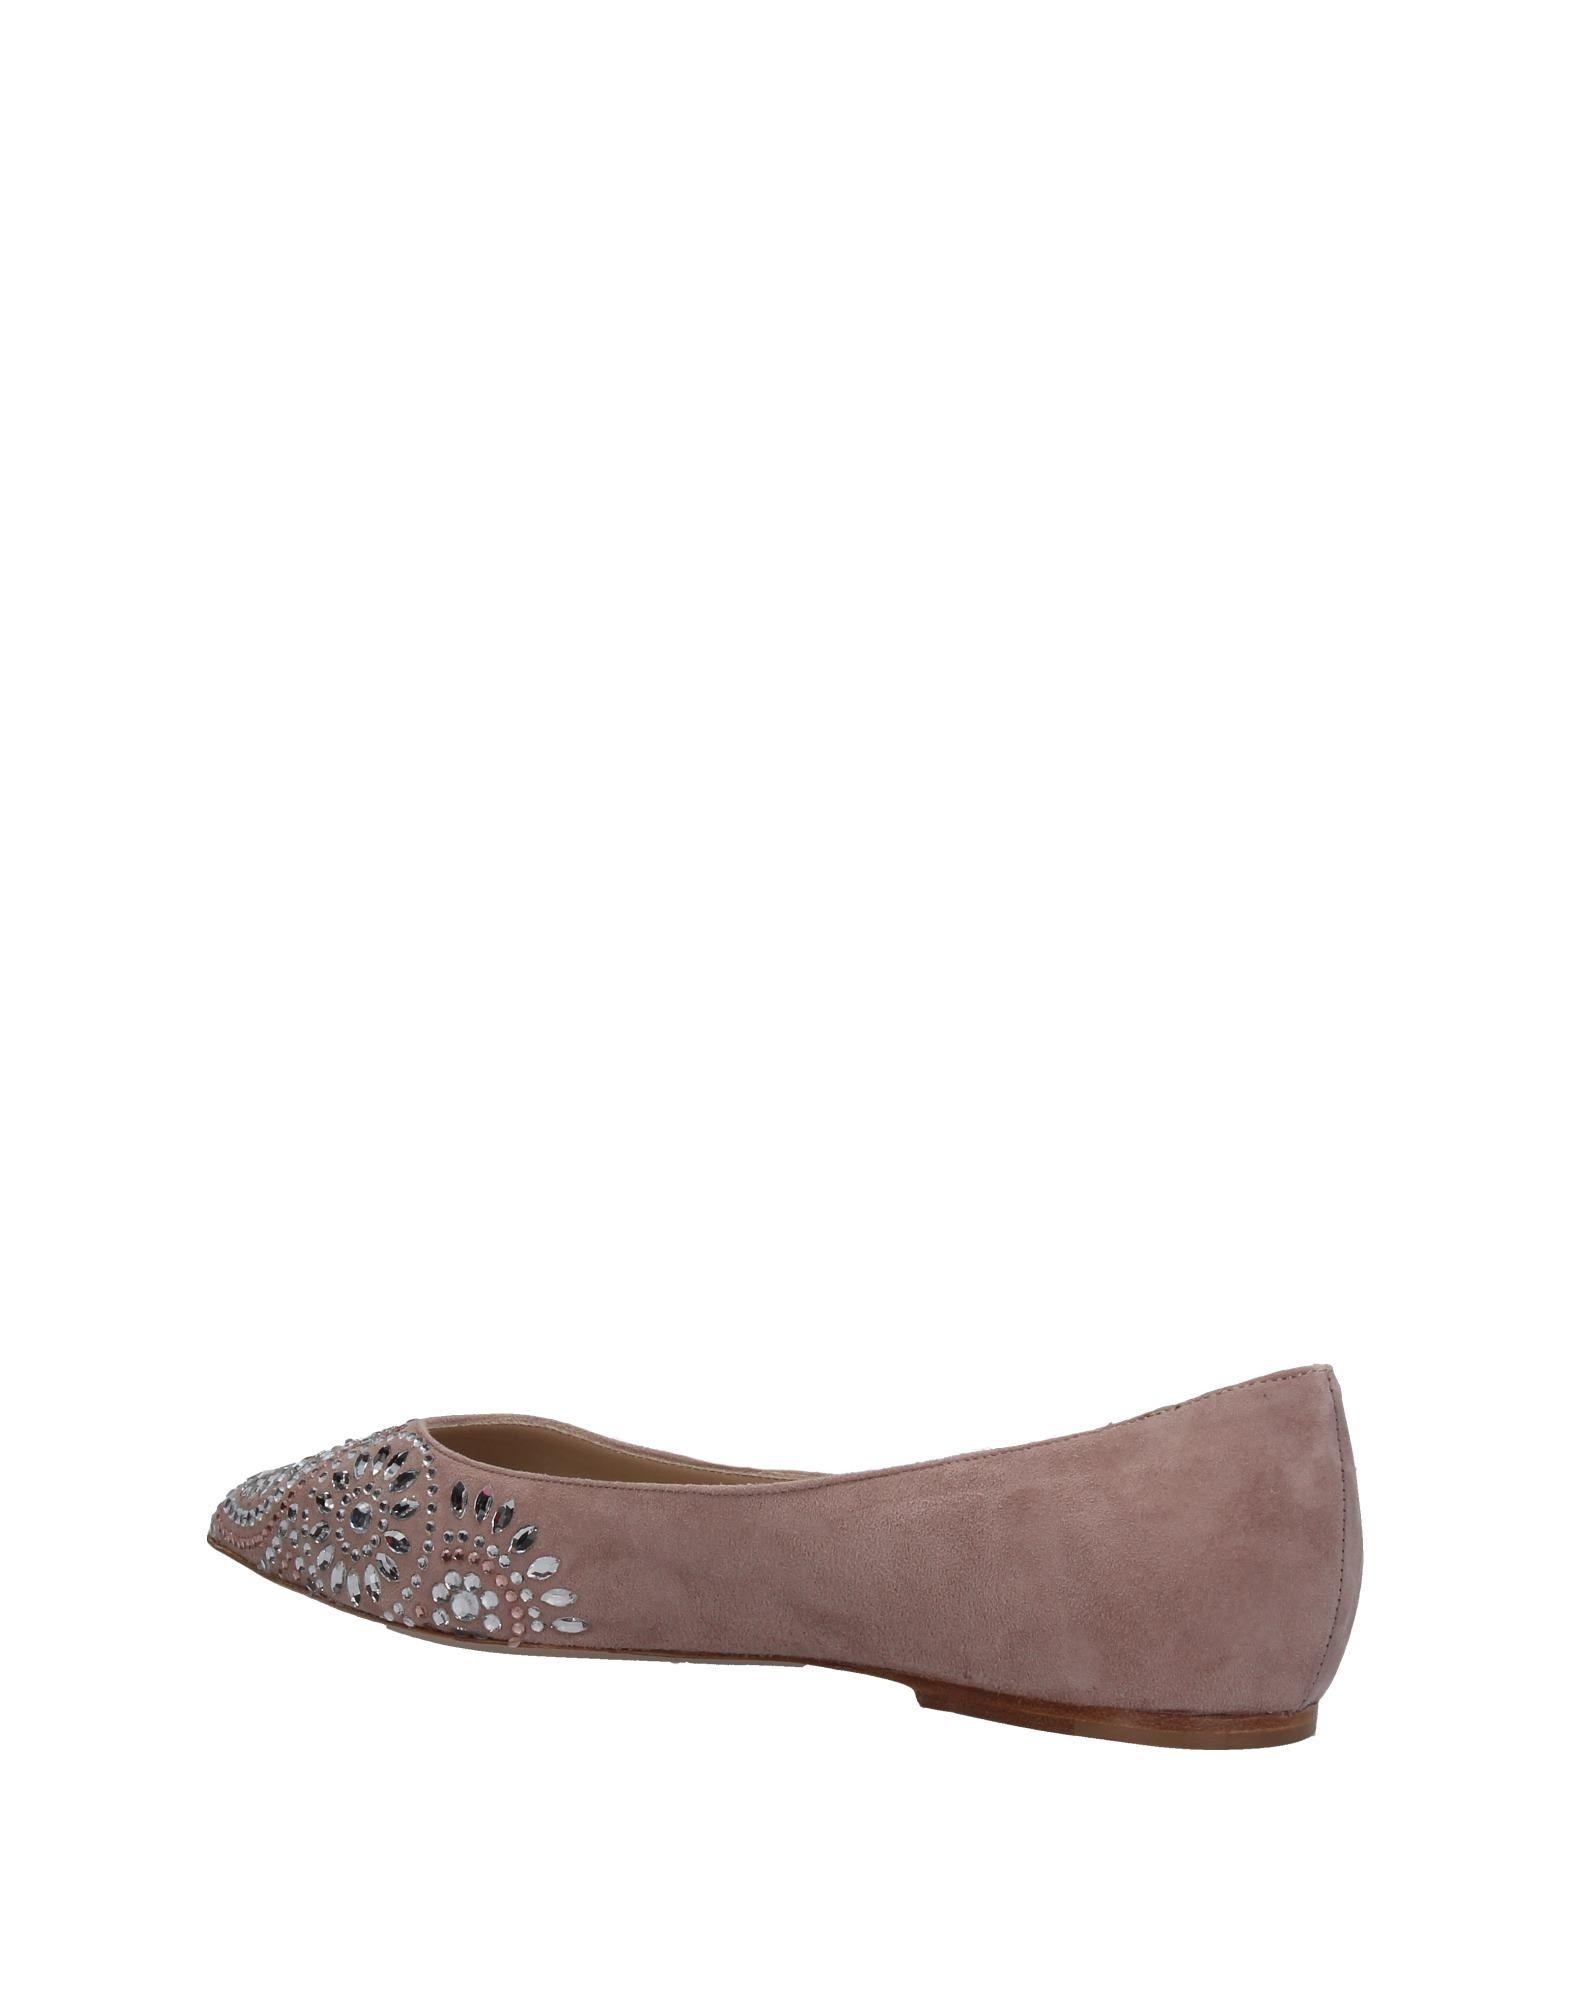 Le Silla Ballerinas Damen  Schuhe 11409916AP Beliebte Schuhe  4cd92c